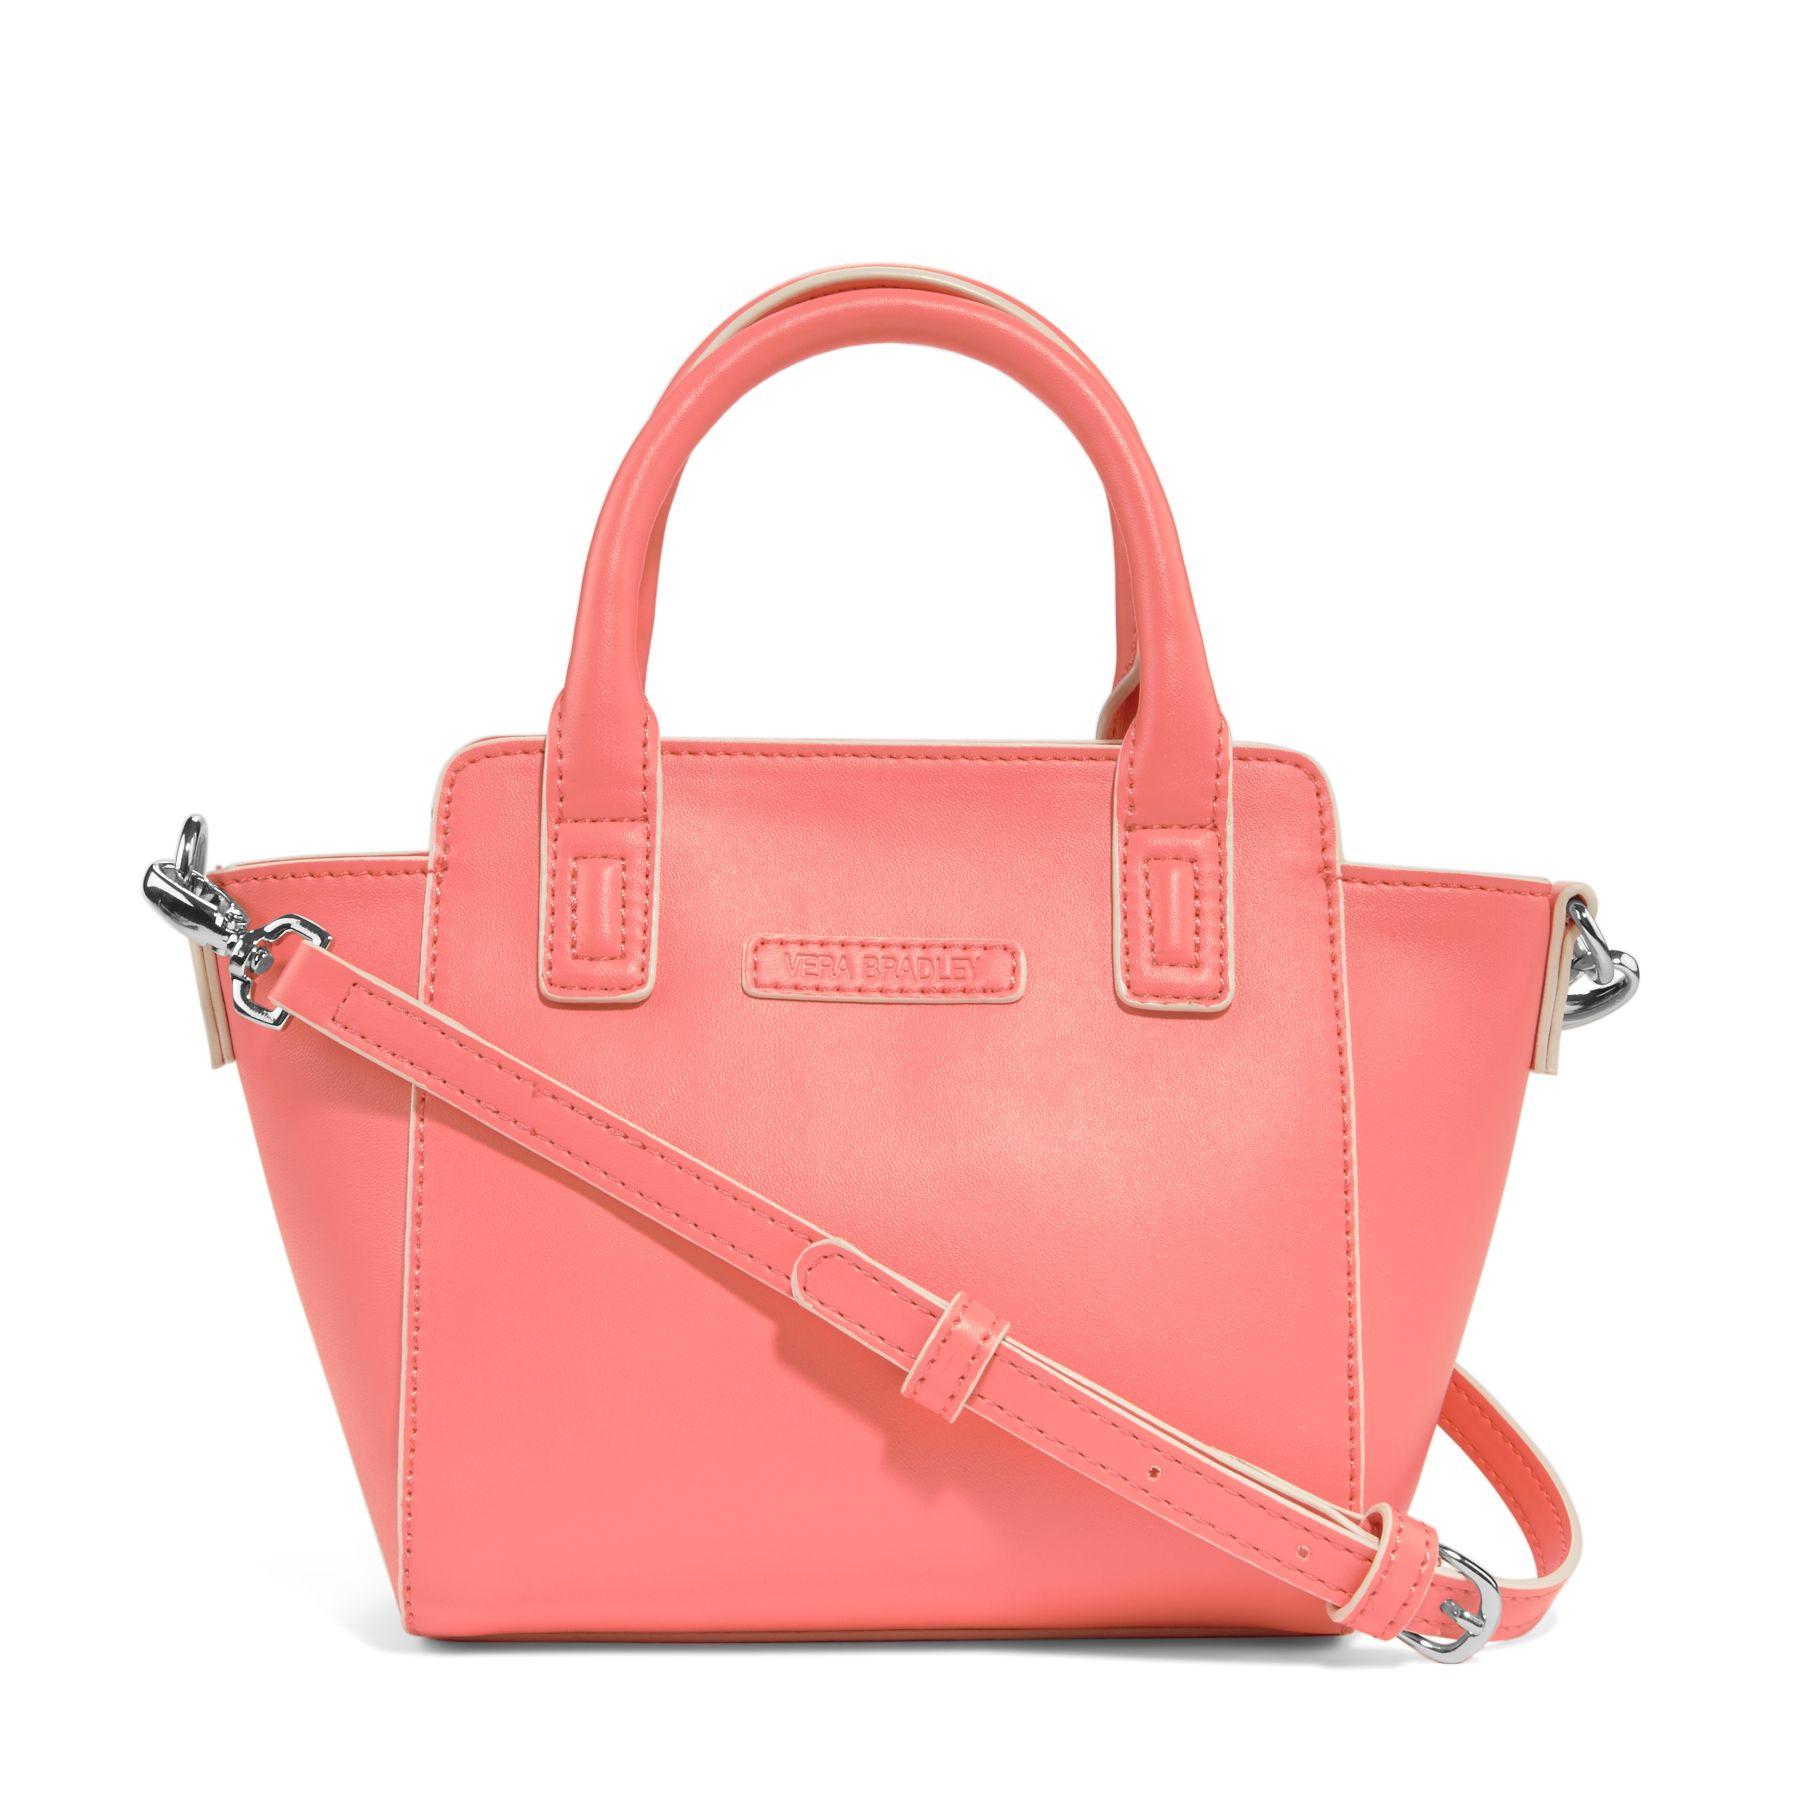 Vera Bradley Faux Leather Mini Crossbody Satchel Bag | eBay